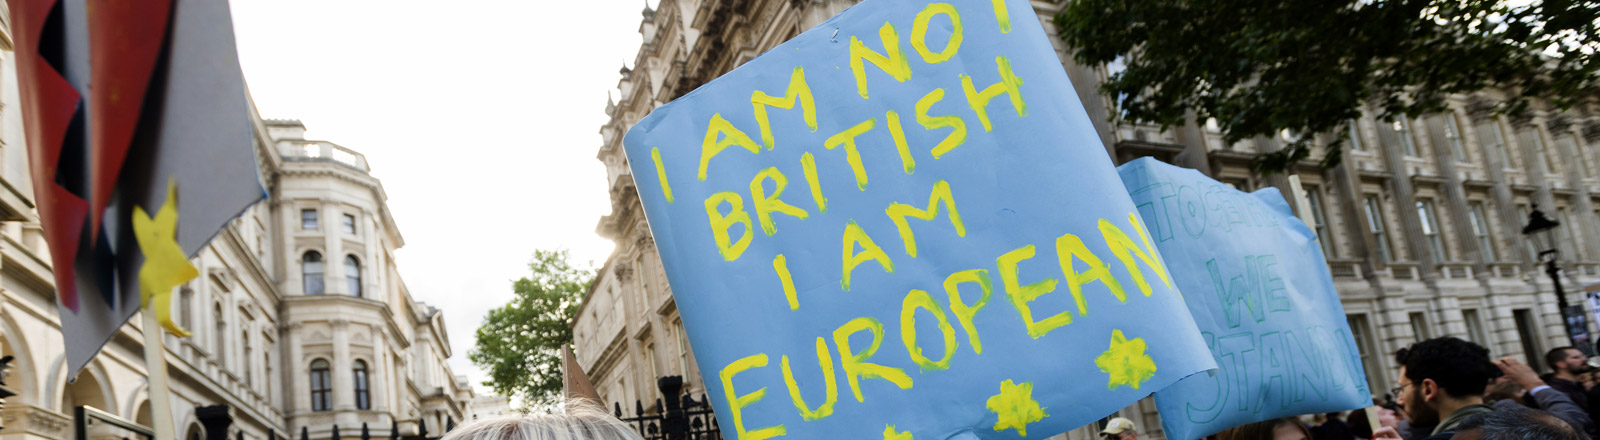 Proteste gegen Brexit